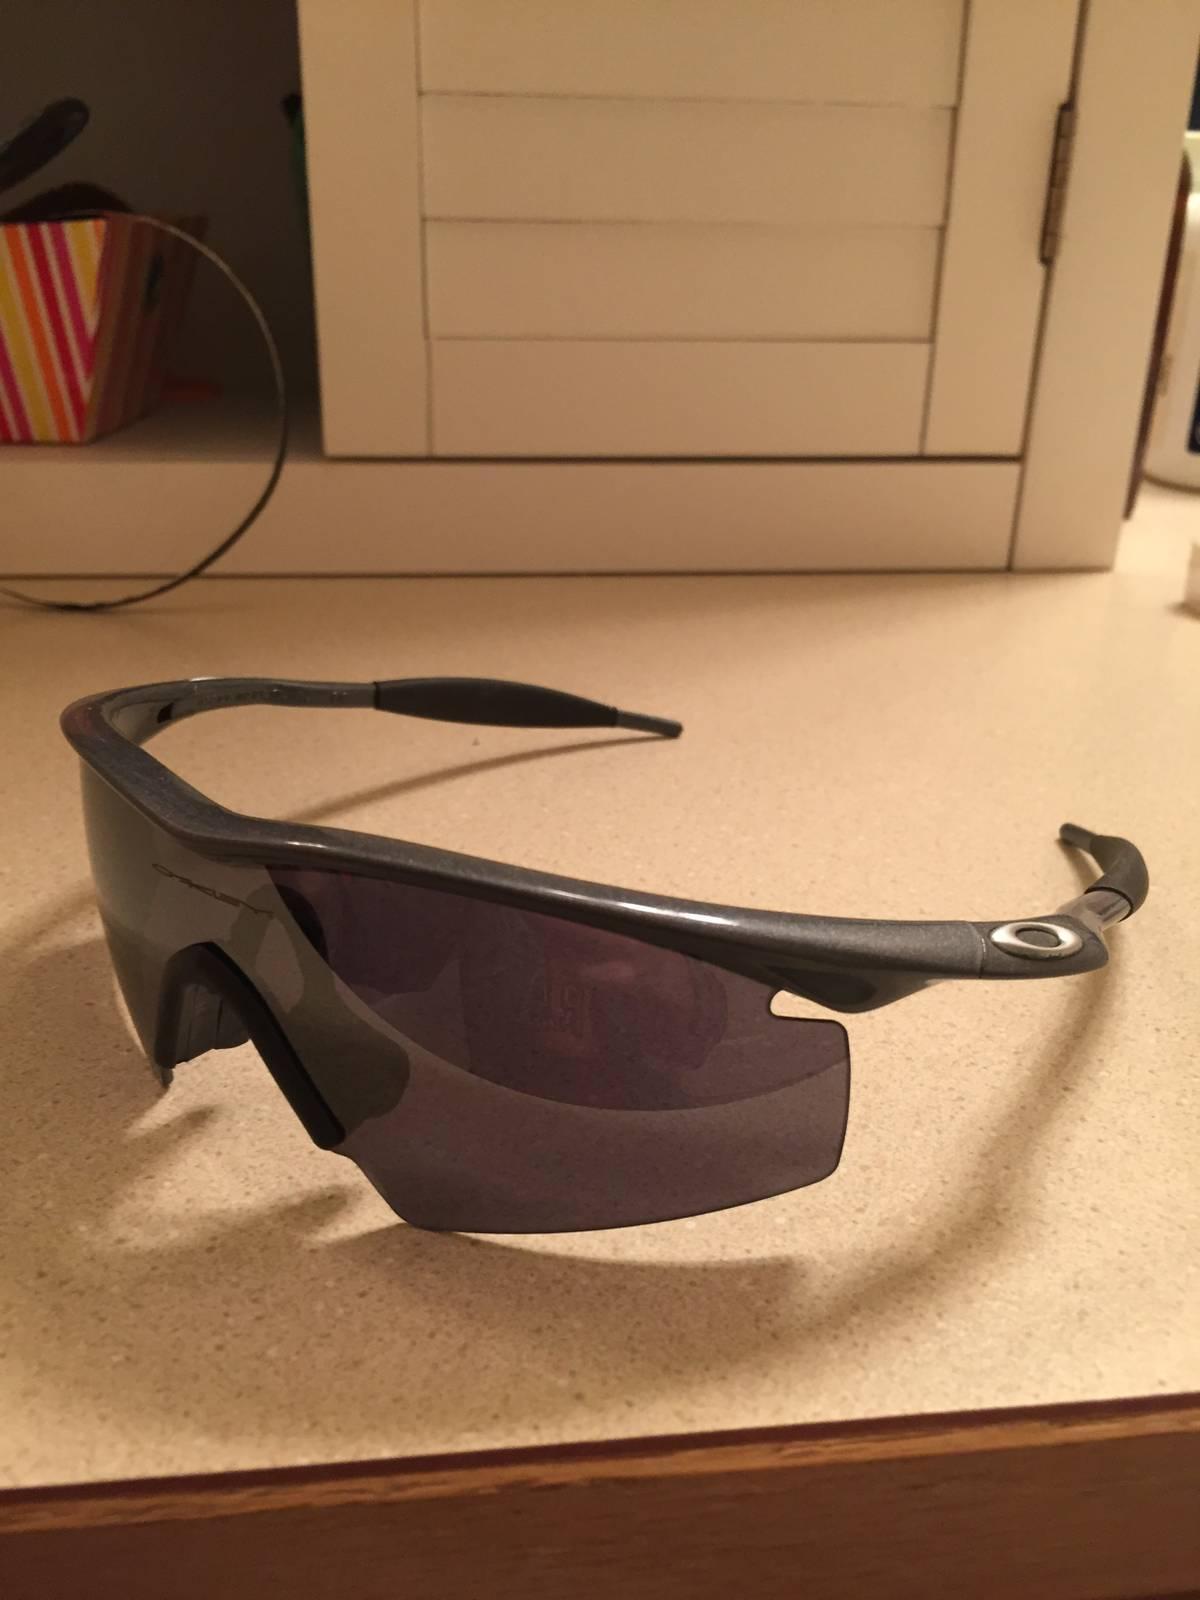 15ed3d0addb Oakley Oakley M2 Frame XL Polarized Sunglasses Size one size ...